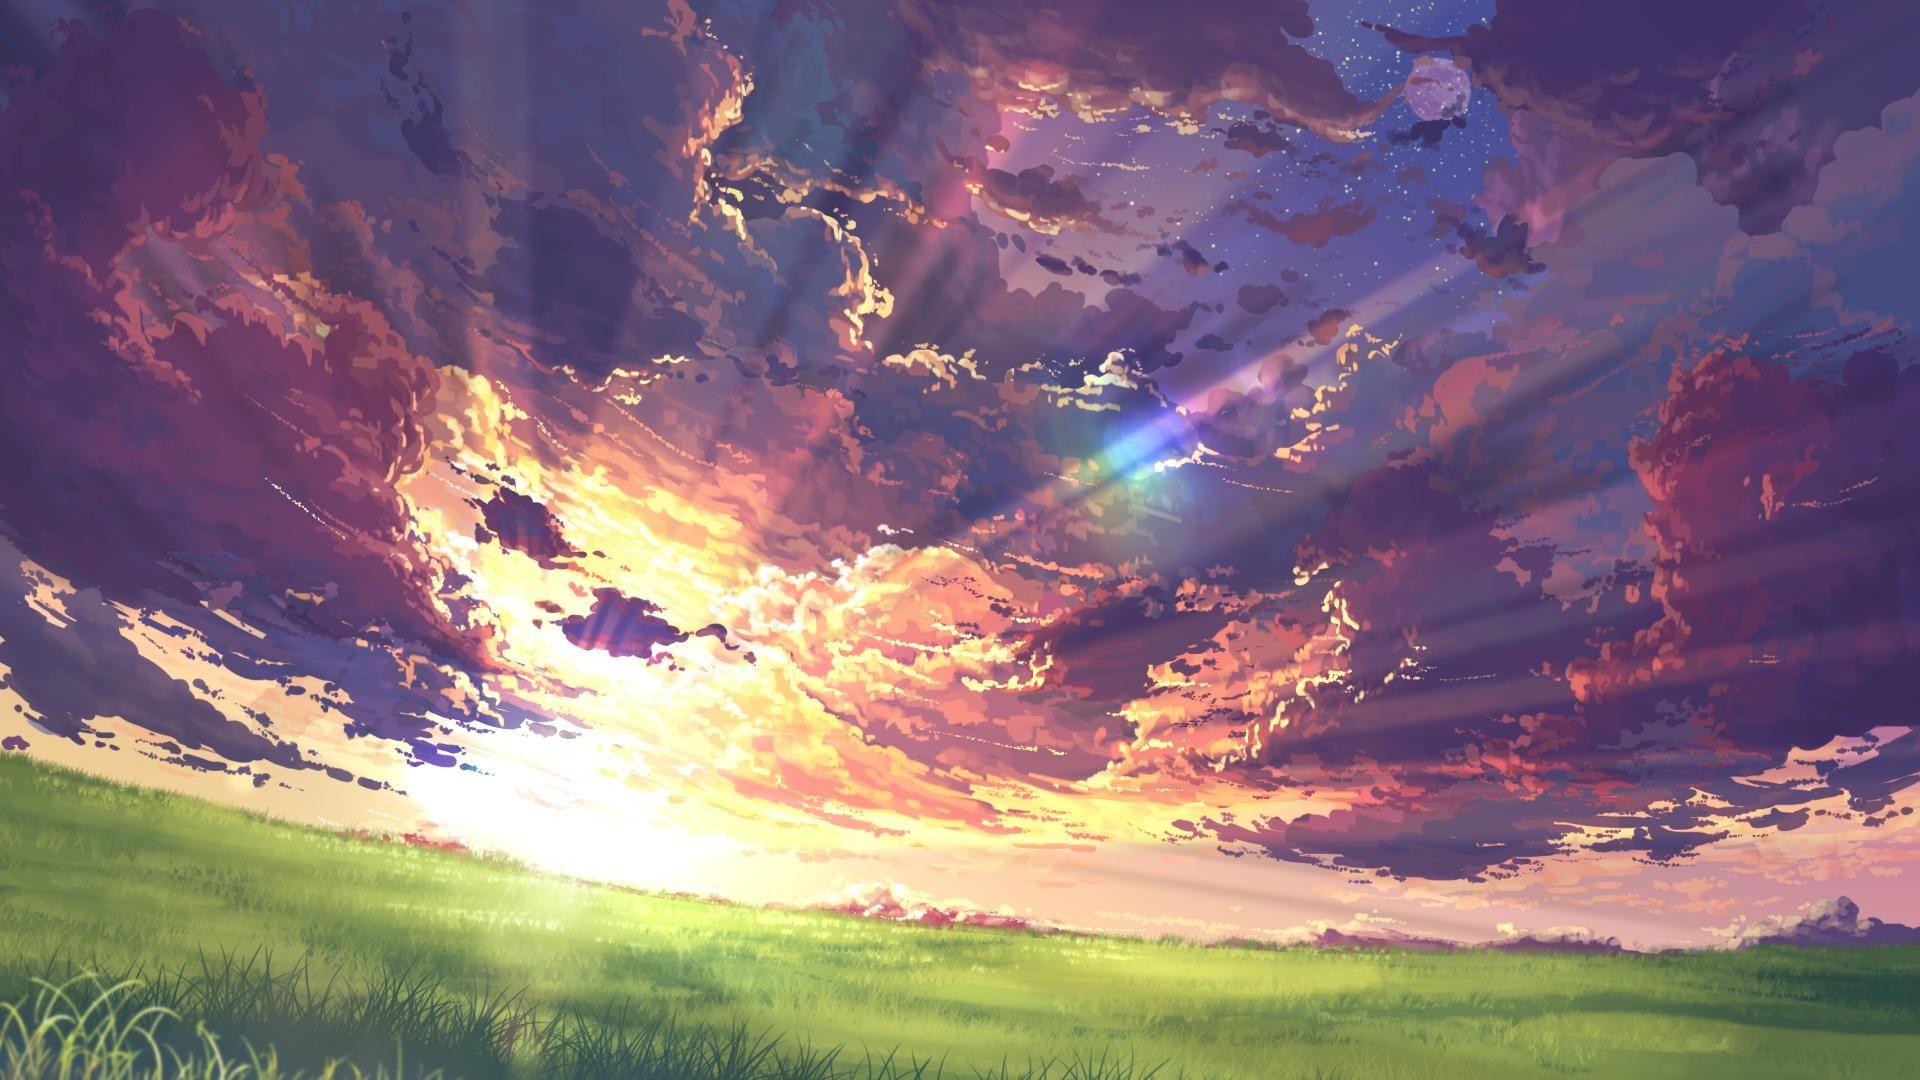 Vibrant Dawn [1920 x 1080] Anime wallpaper 1920x1080